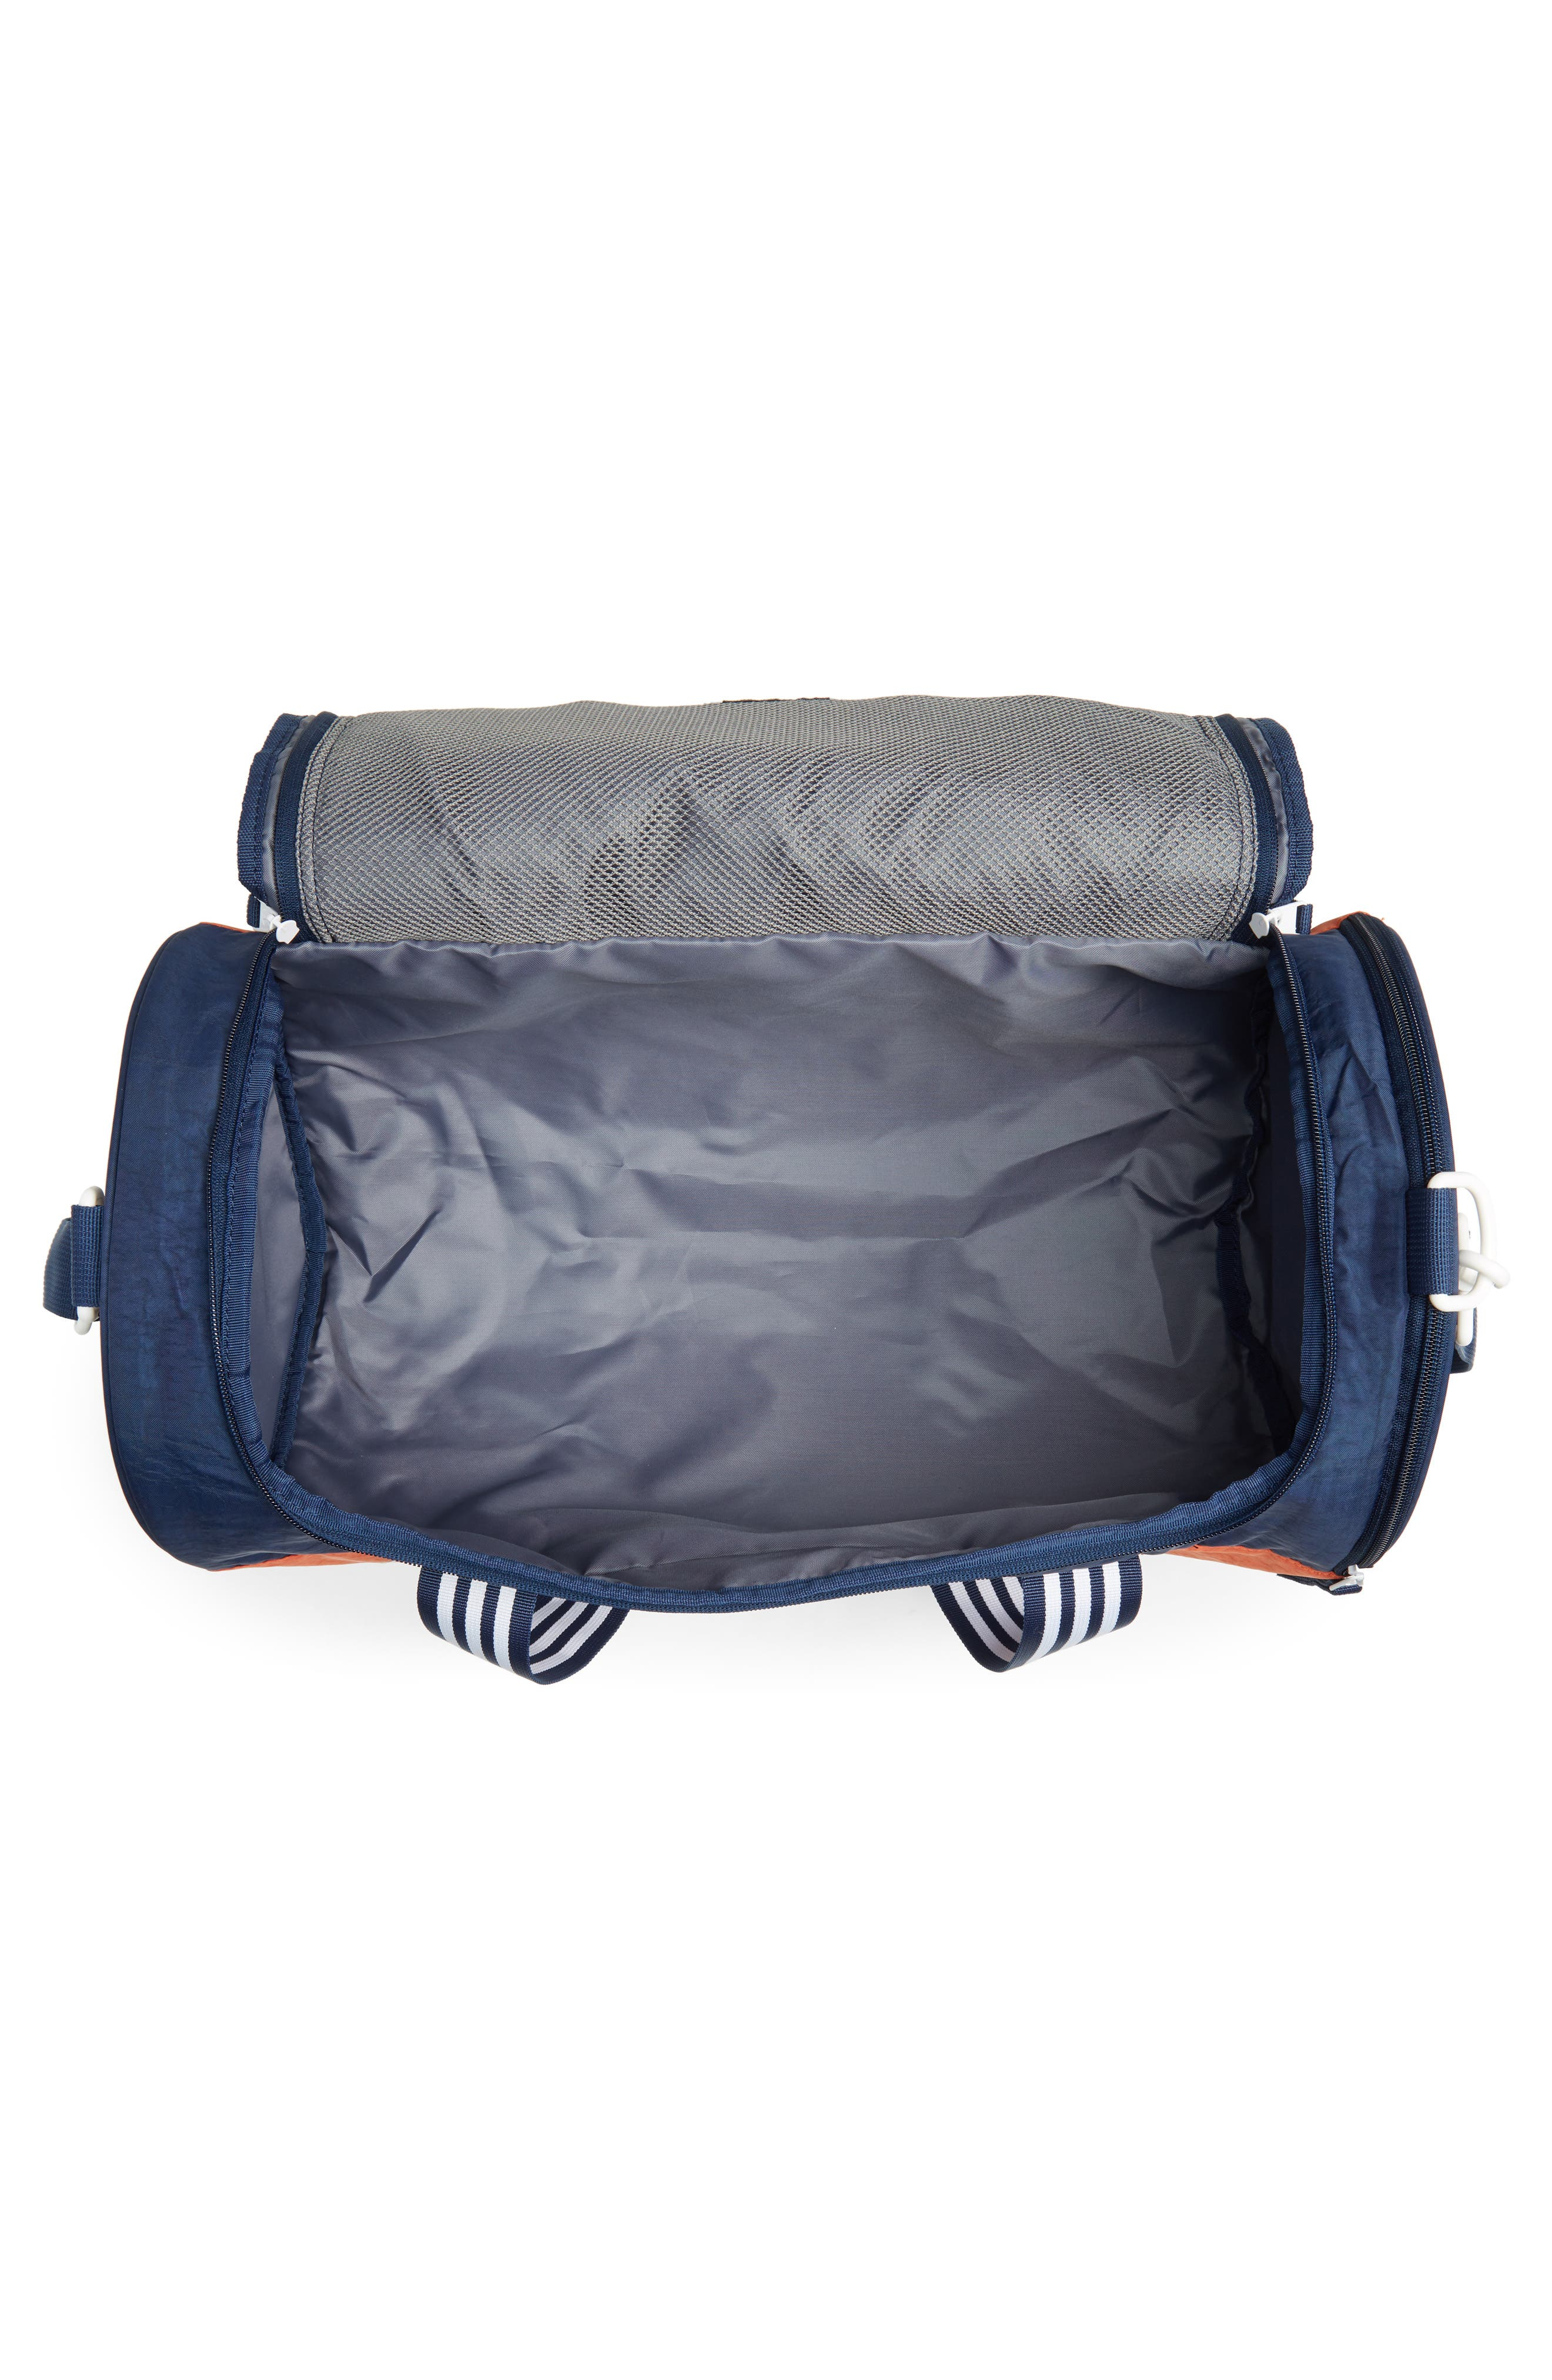 ADIDAS ORIGINALS, adidas Spirit Roll Duffle Bag, Alternate thumbnail 4, color, COLLEGIATE NAVY/ AMBER/ WHITE